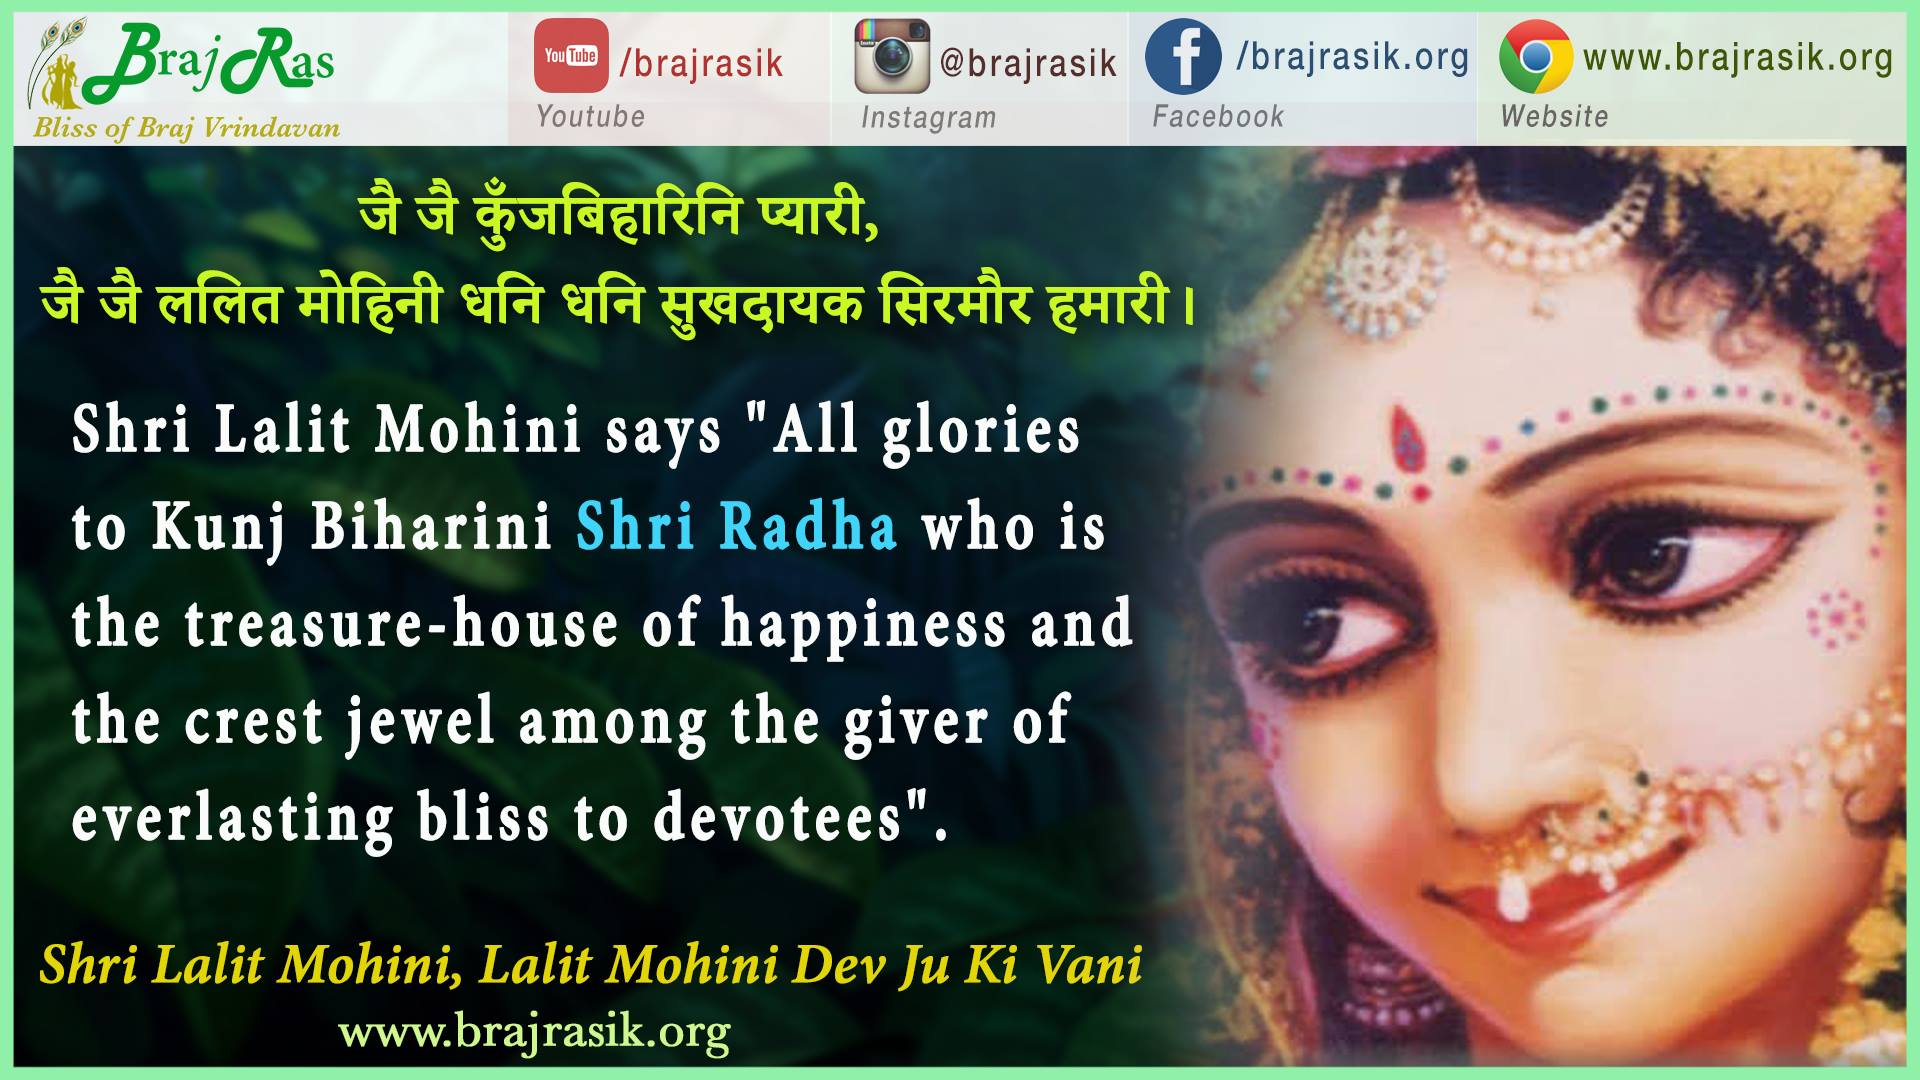 Jai Jai Kunjbiharini Pyari - Shri Lalit Mohini Dev, Shri Lalit Mohini Dev Ju Ki Vani